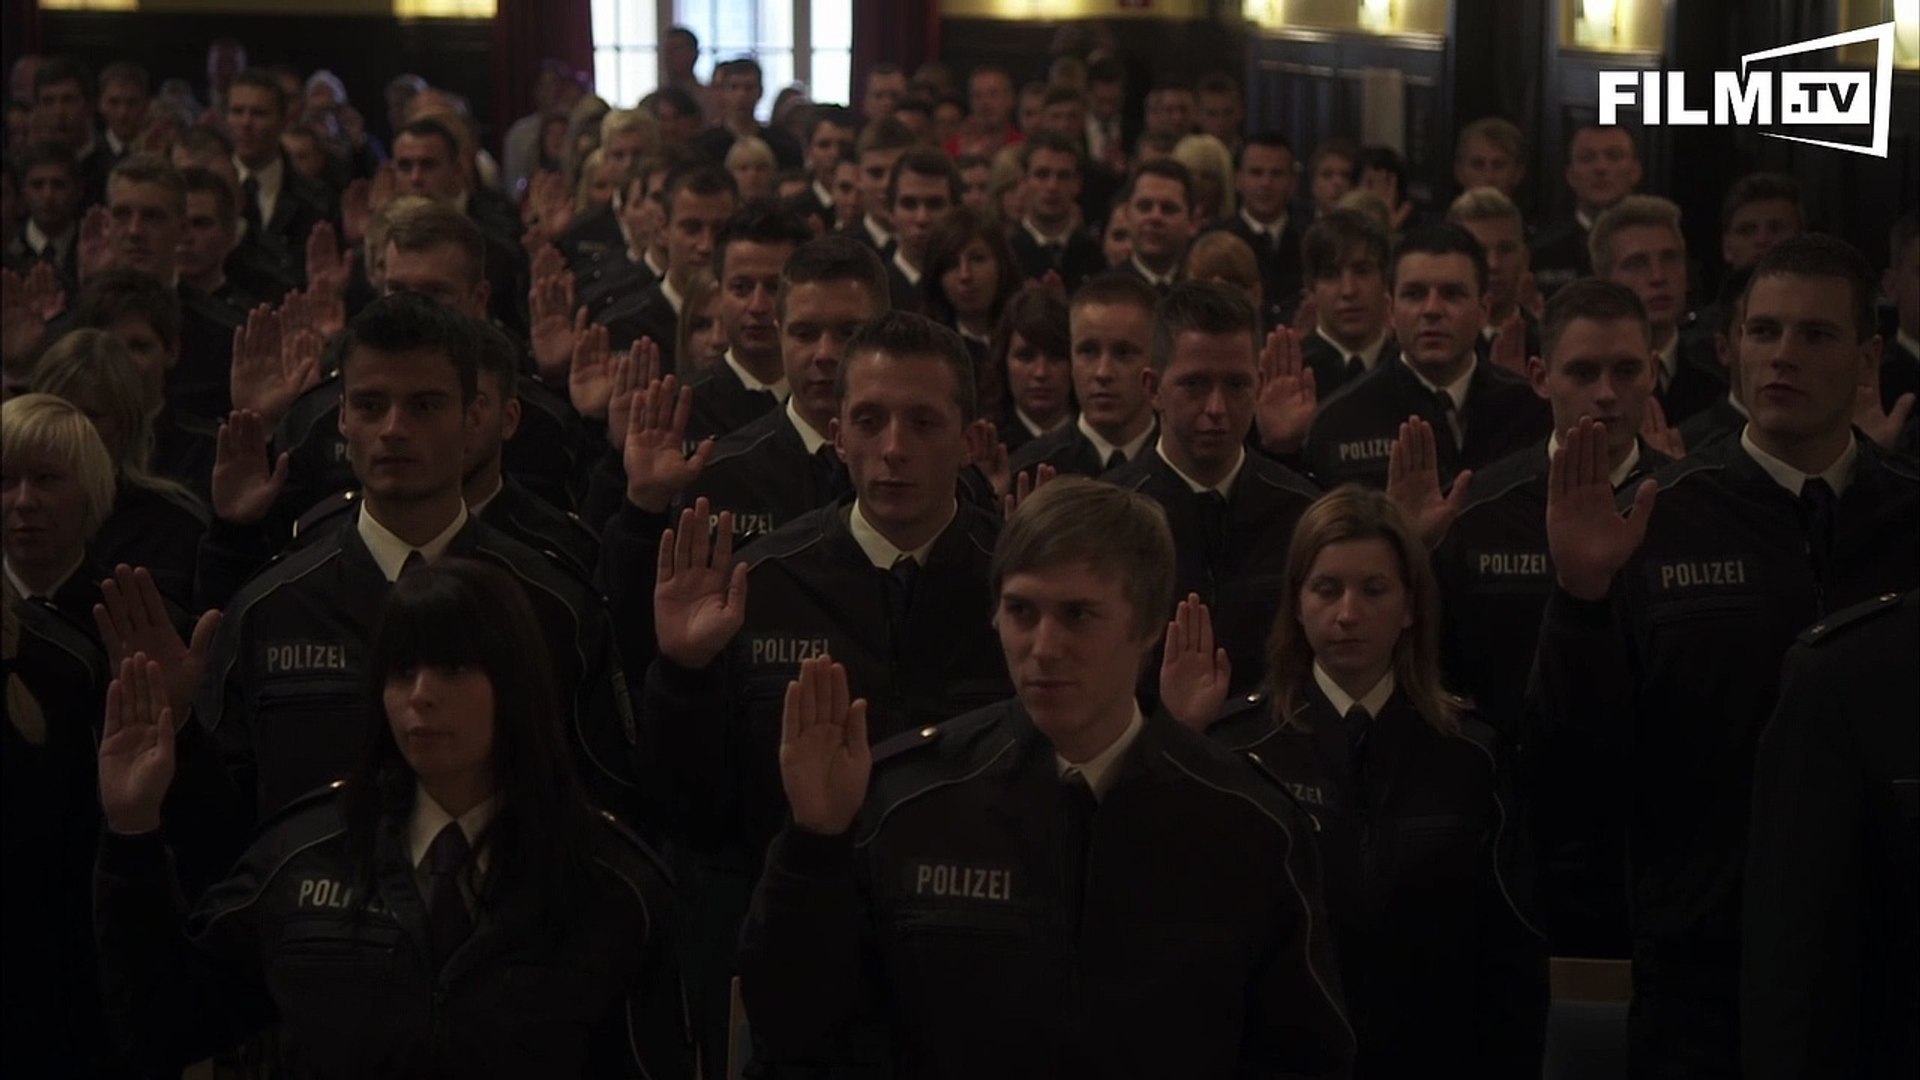 Staatsdiener - Trailer - Filmkritik (2015) - Trailer